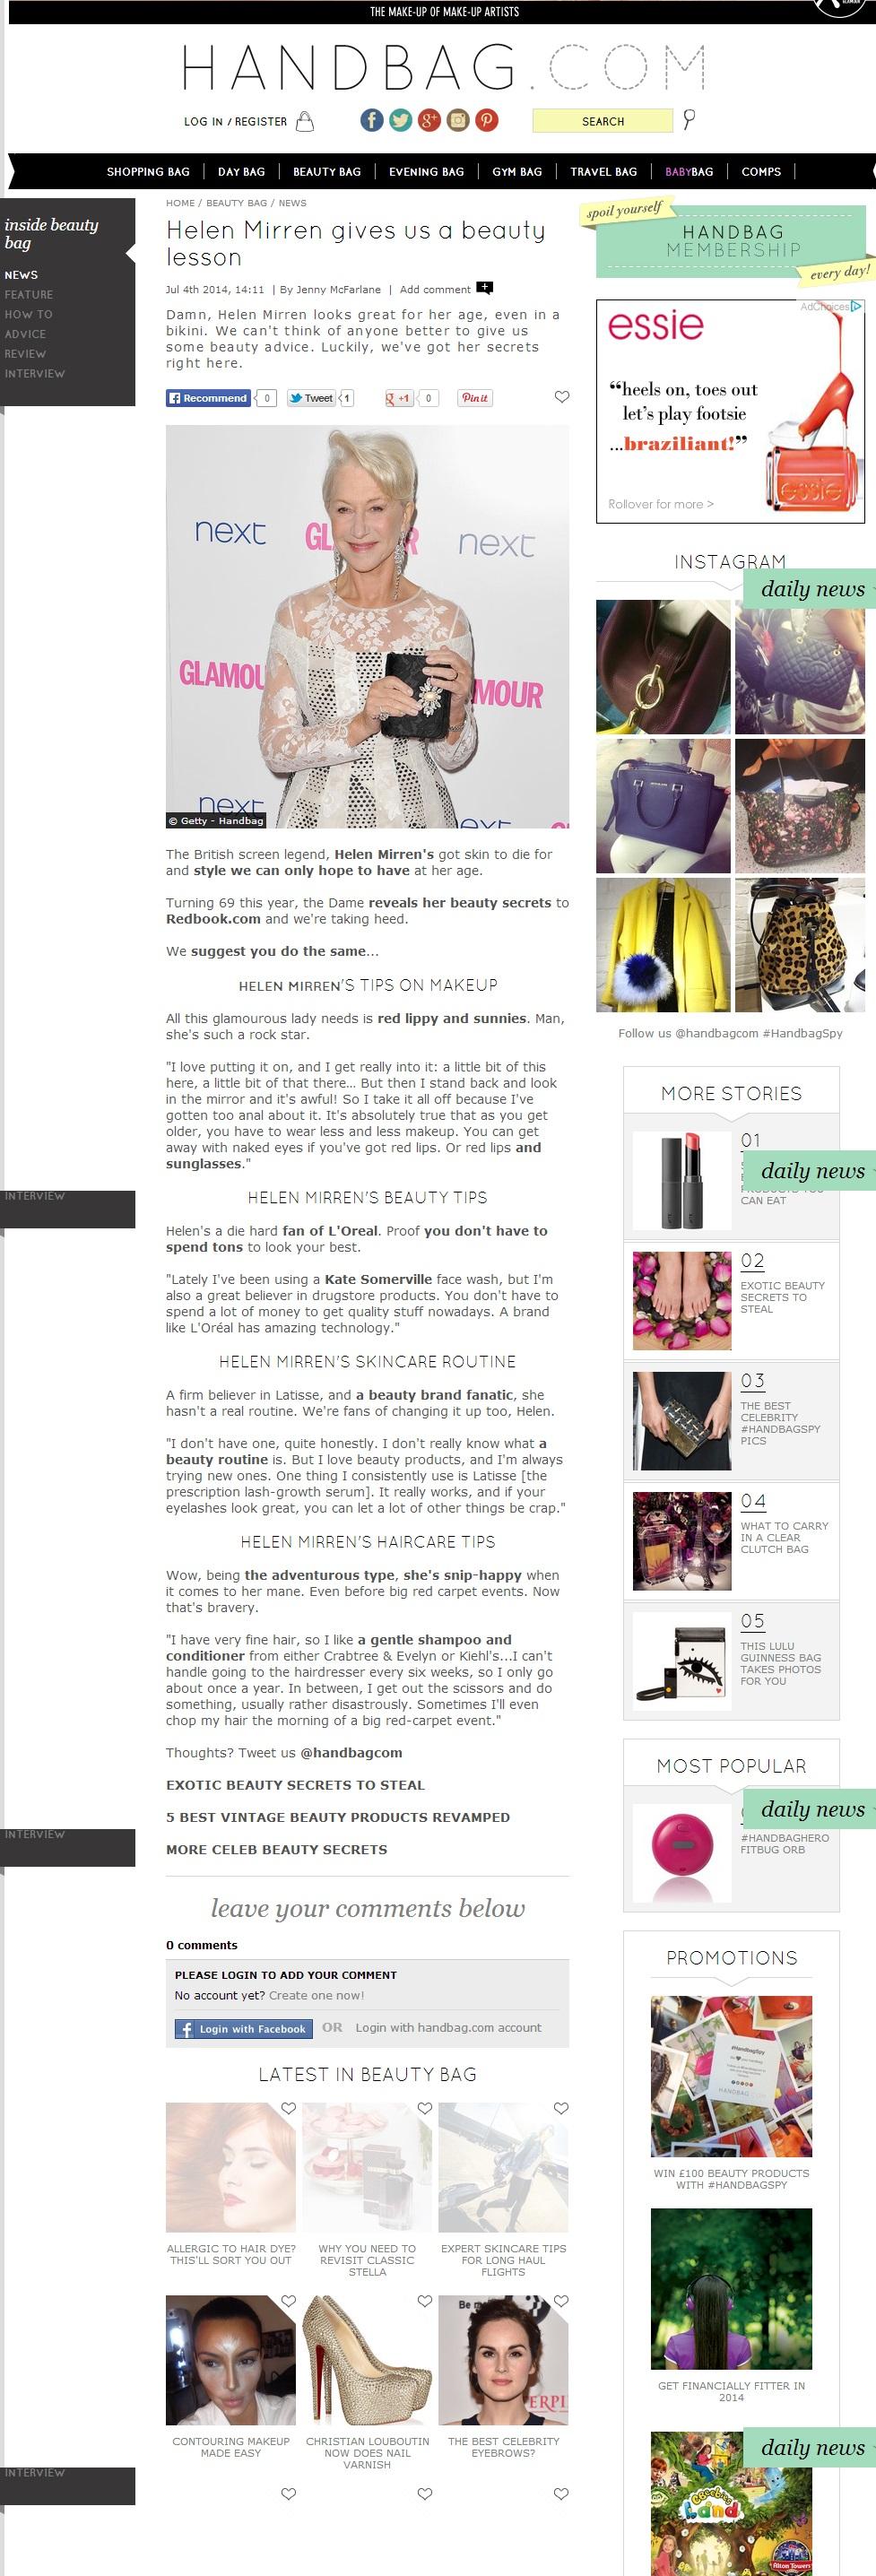 screencapture-www-handbag-com-beauty-bag-news-a582190-helen-mirren-gives-us-a-beauty-lesson-html